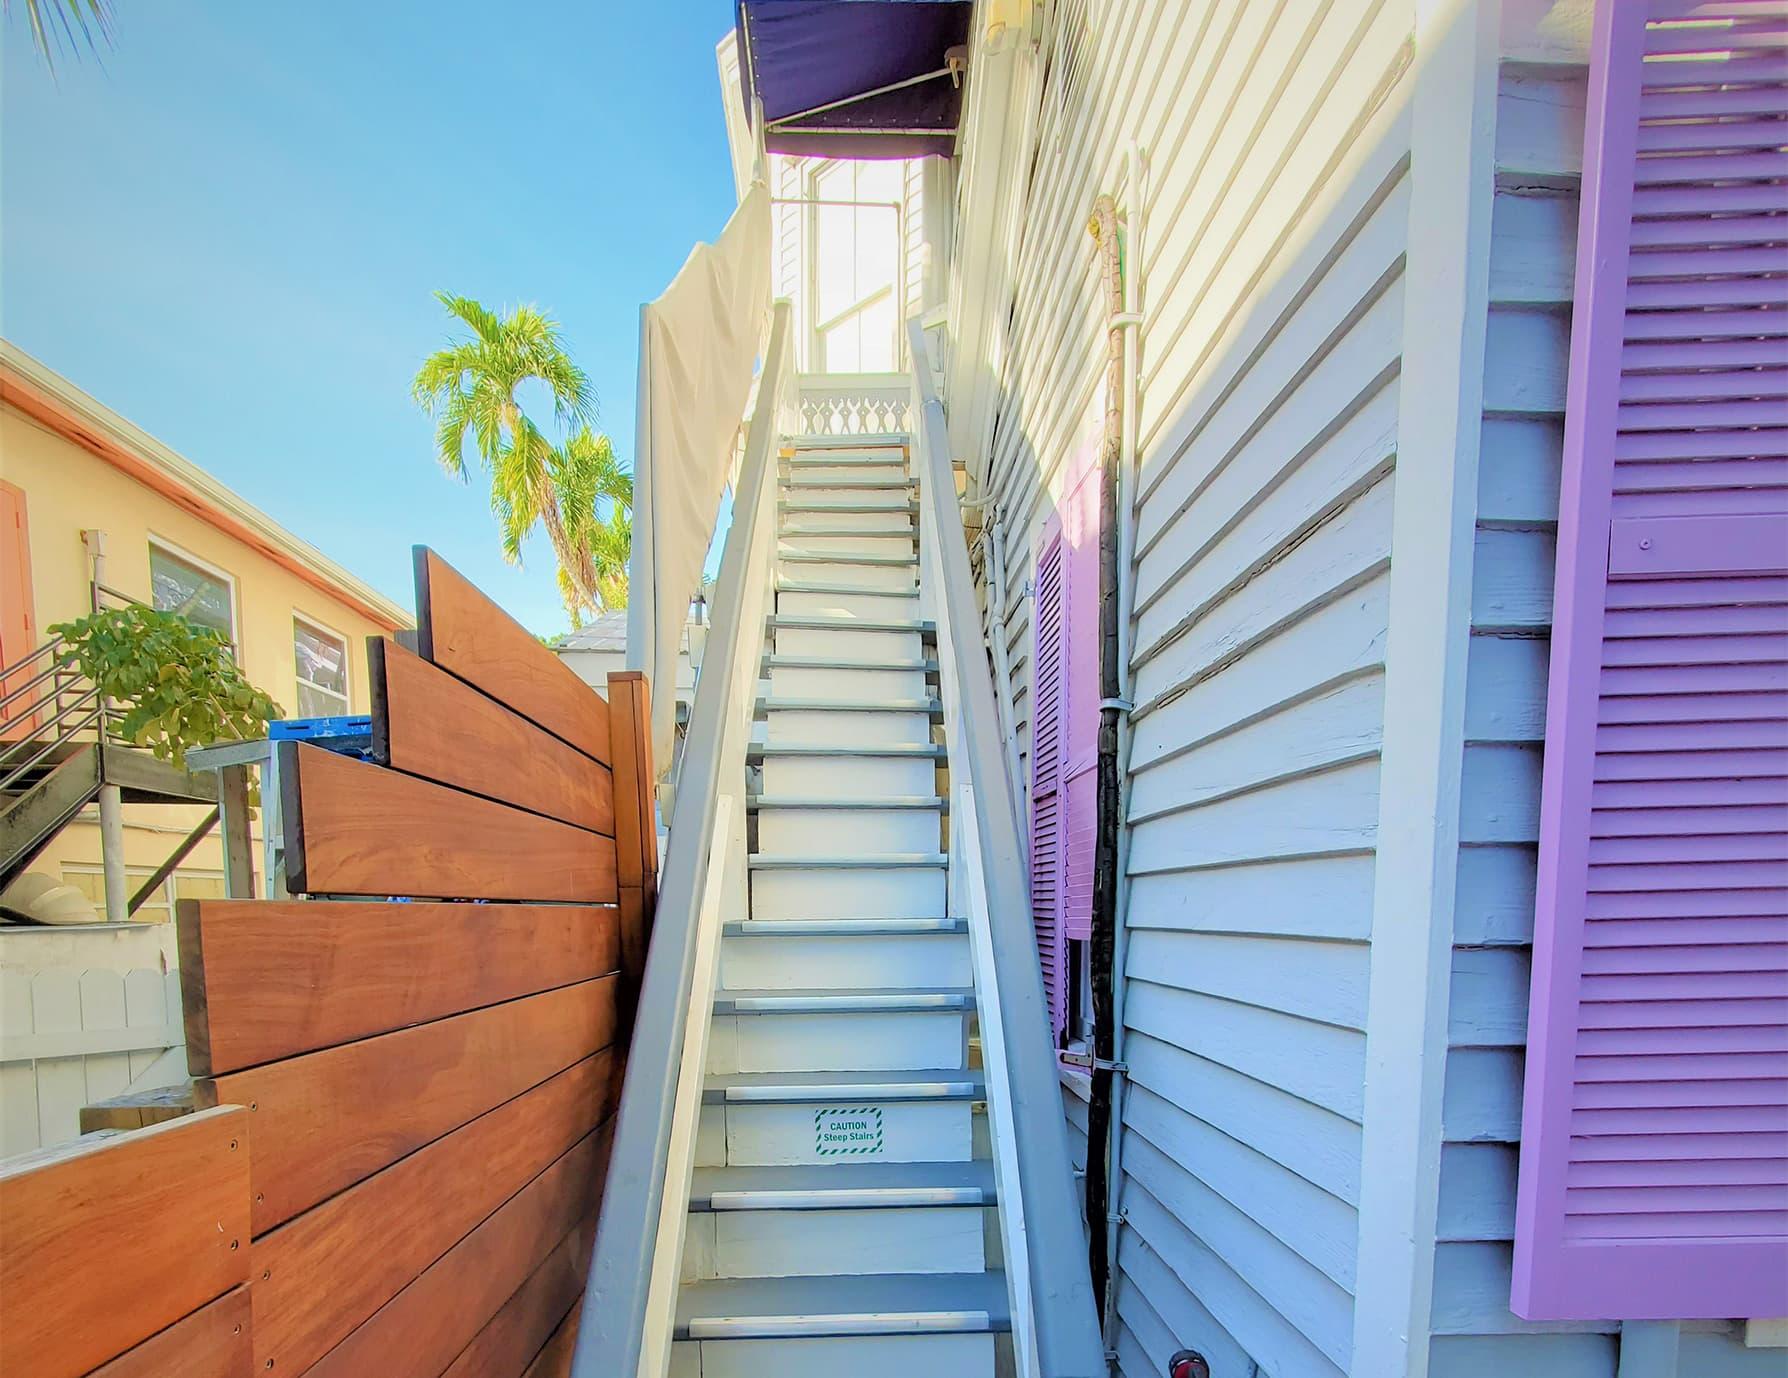 Sun Room private entrance exterior staircase